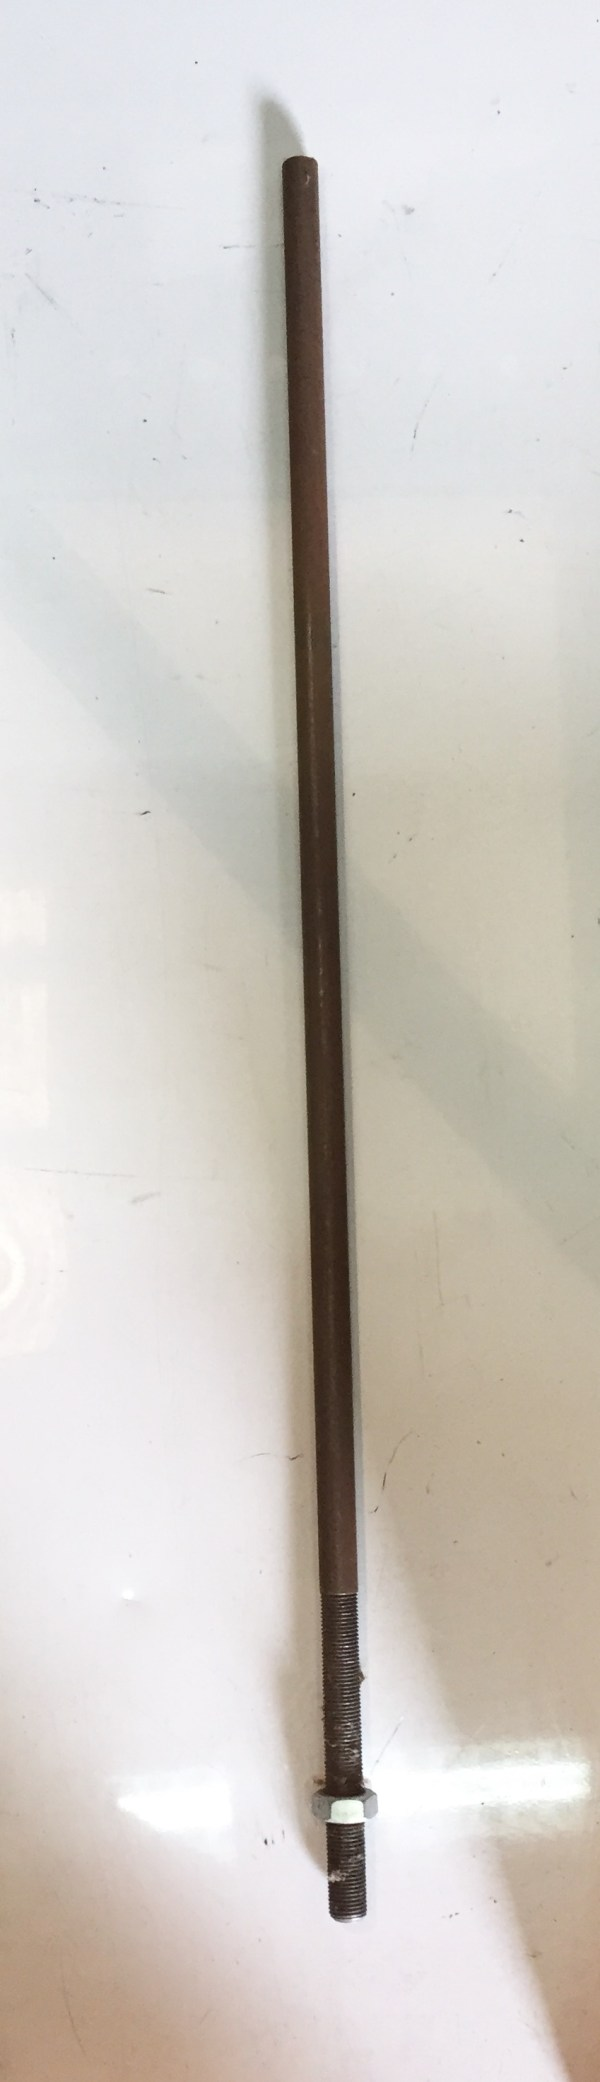 Dempster Rod, Push AB26889